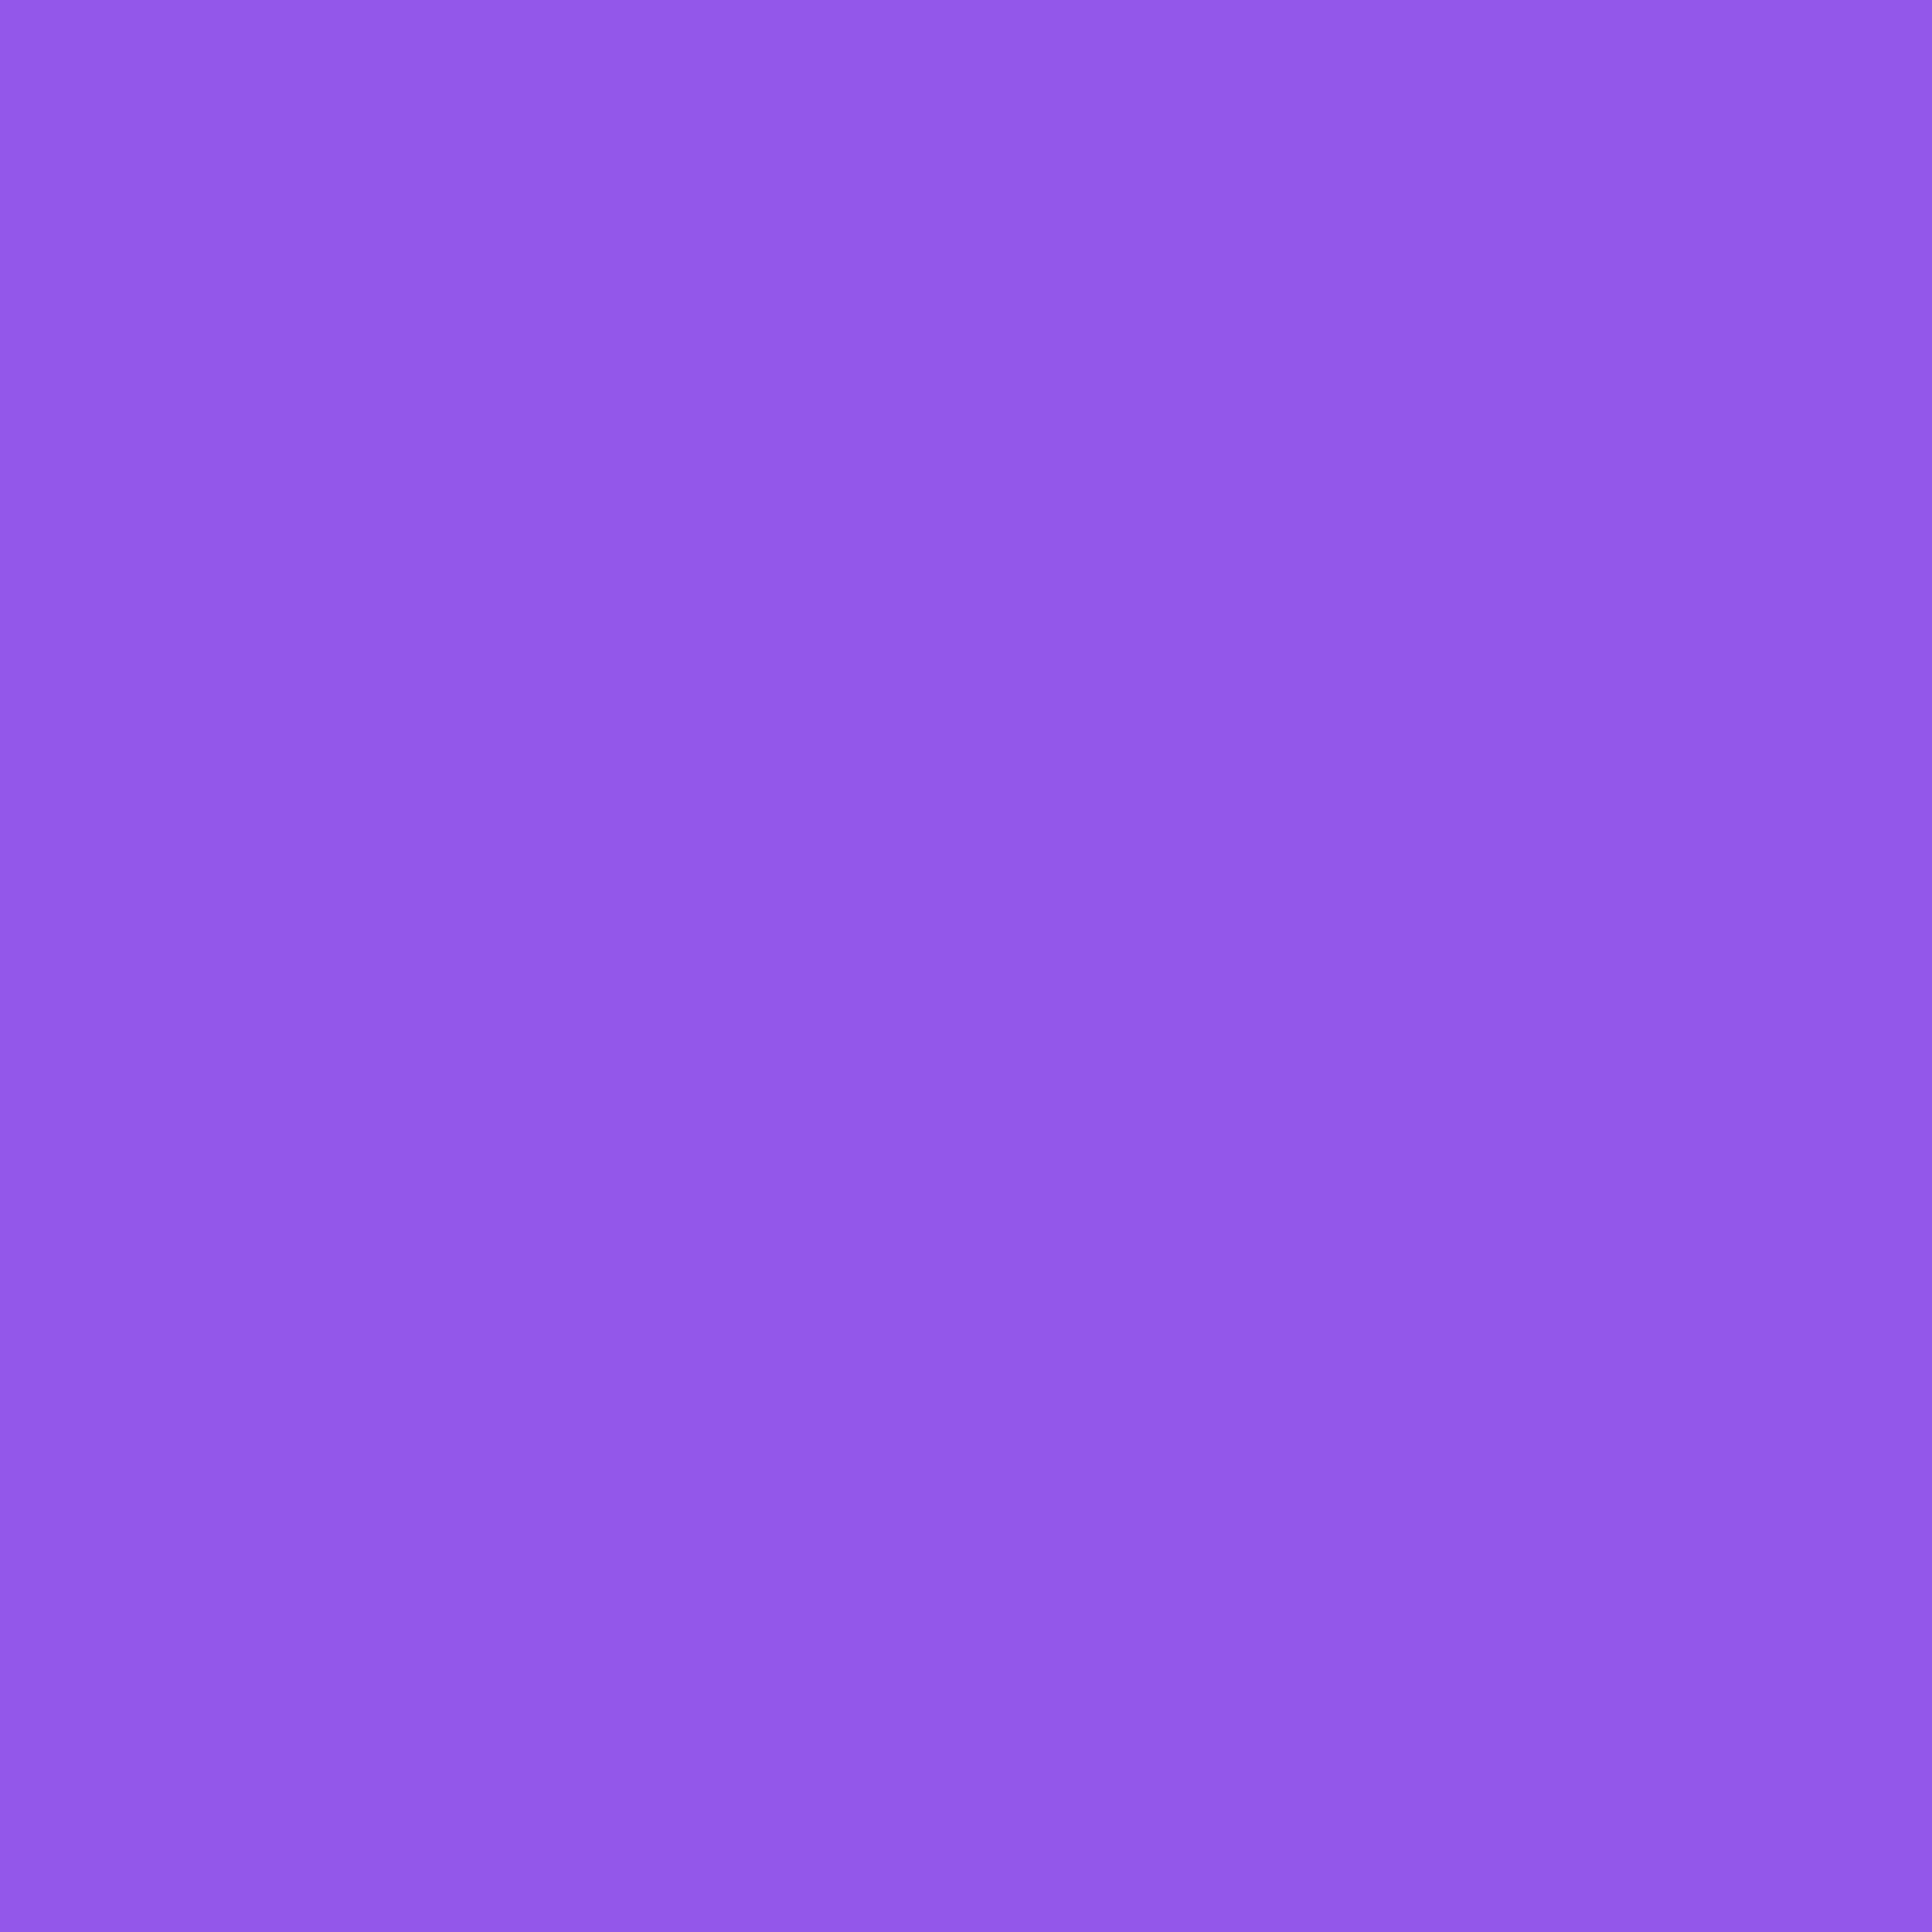 2732x2732 Lavender Indigo Solid Color Background